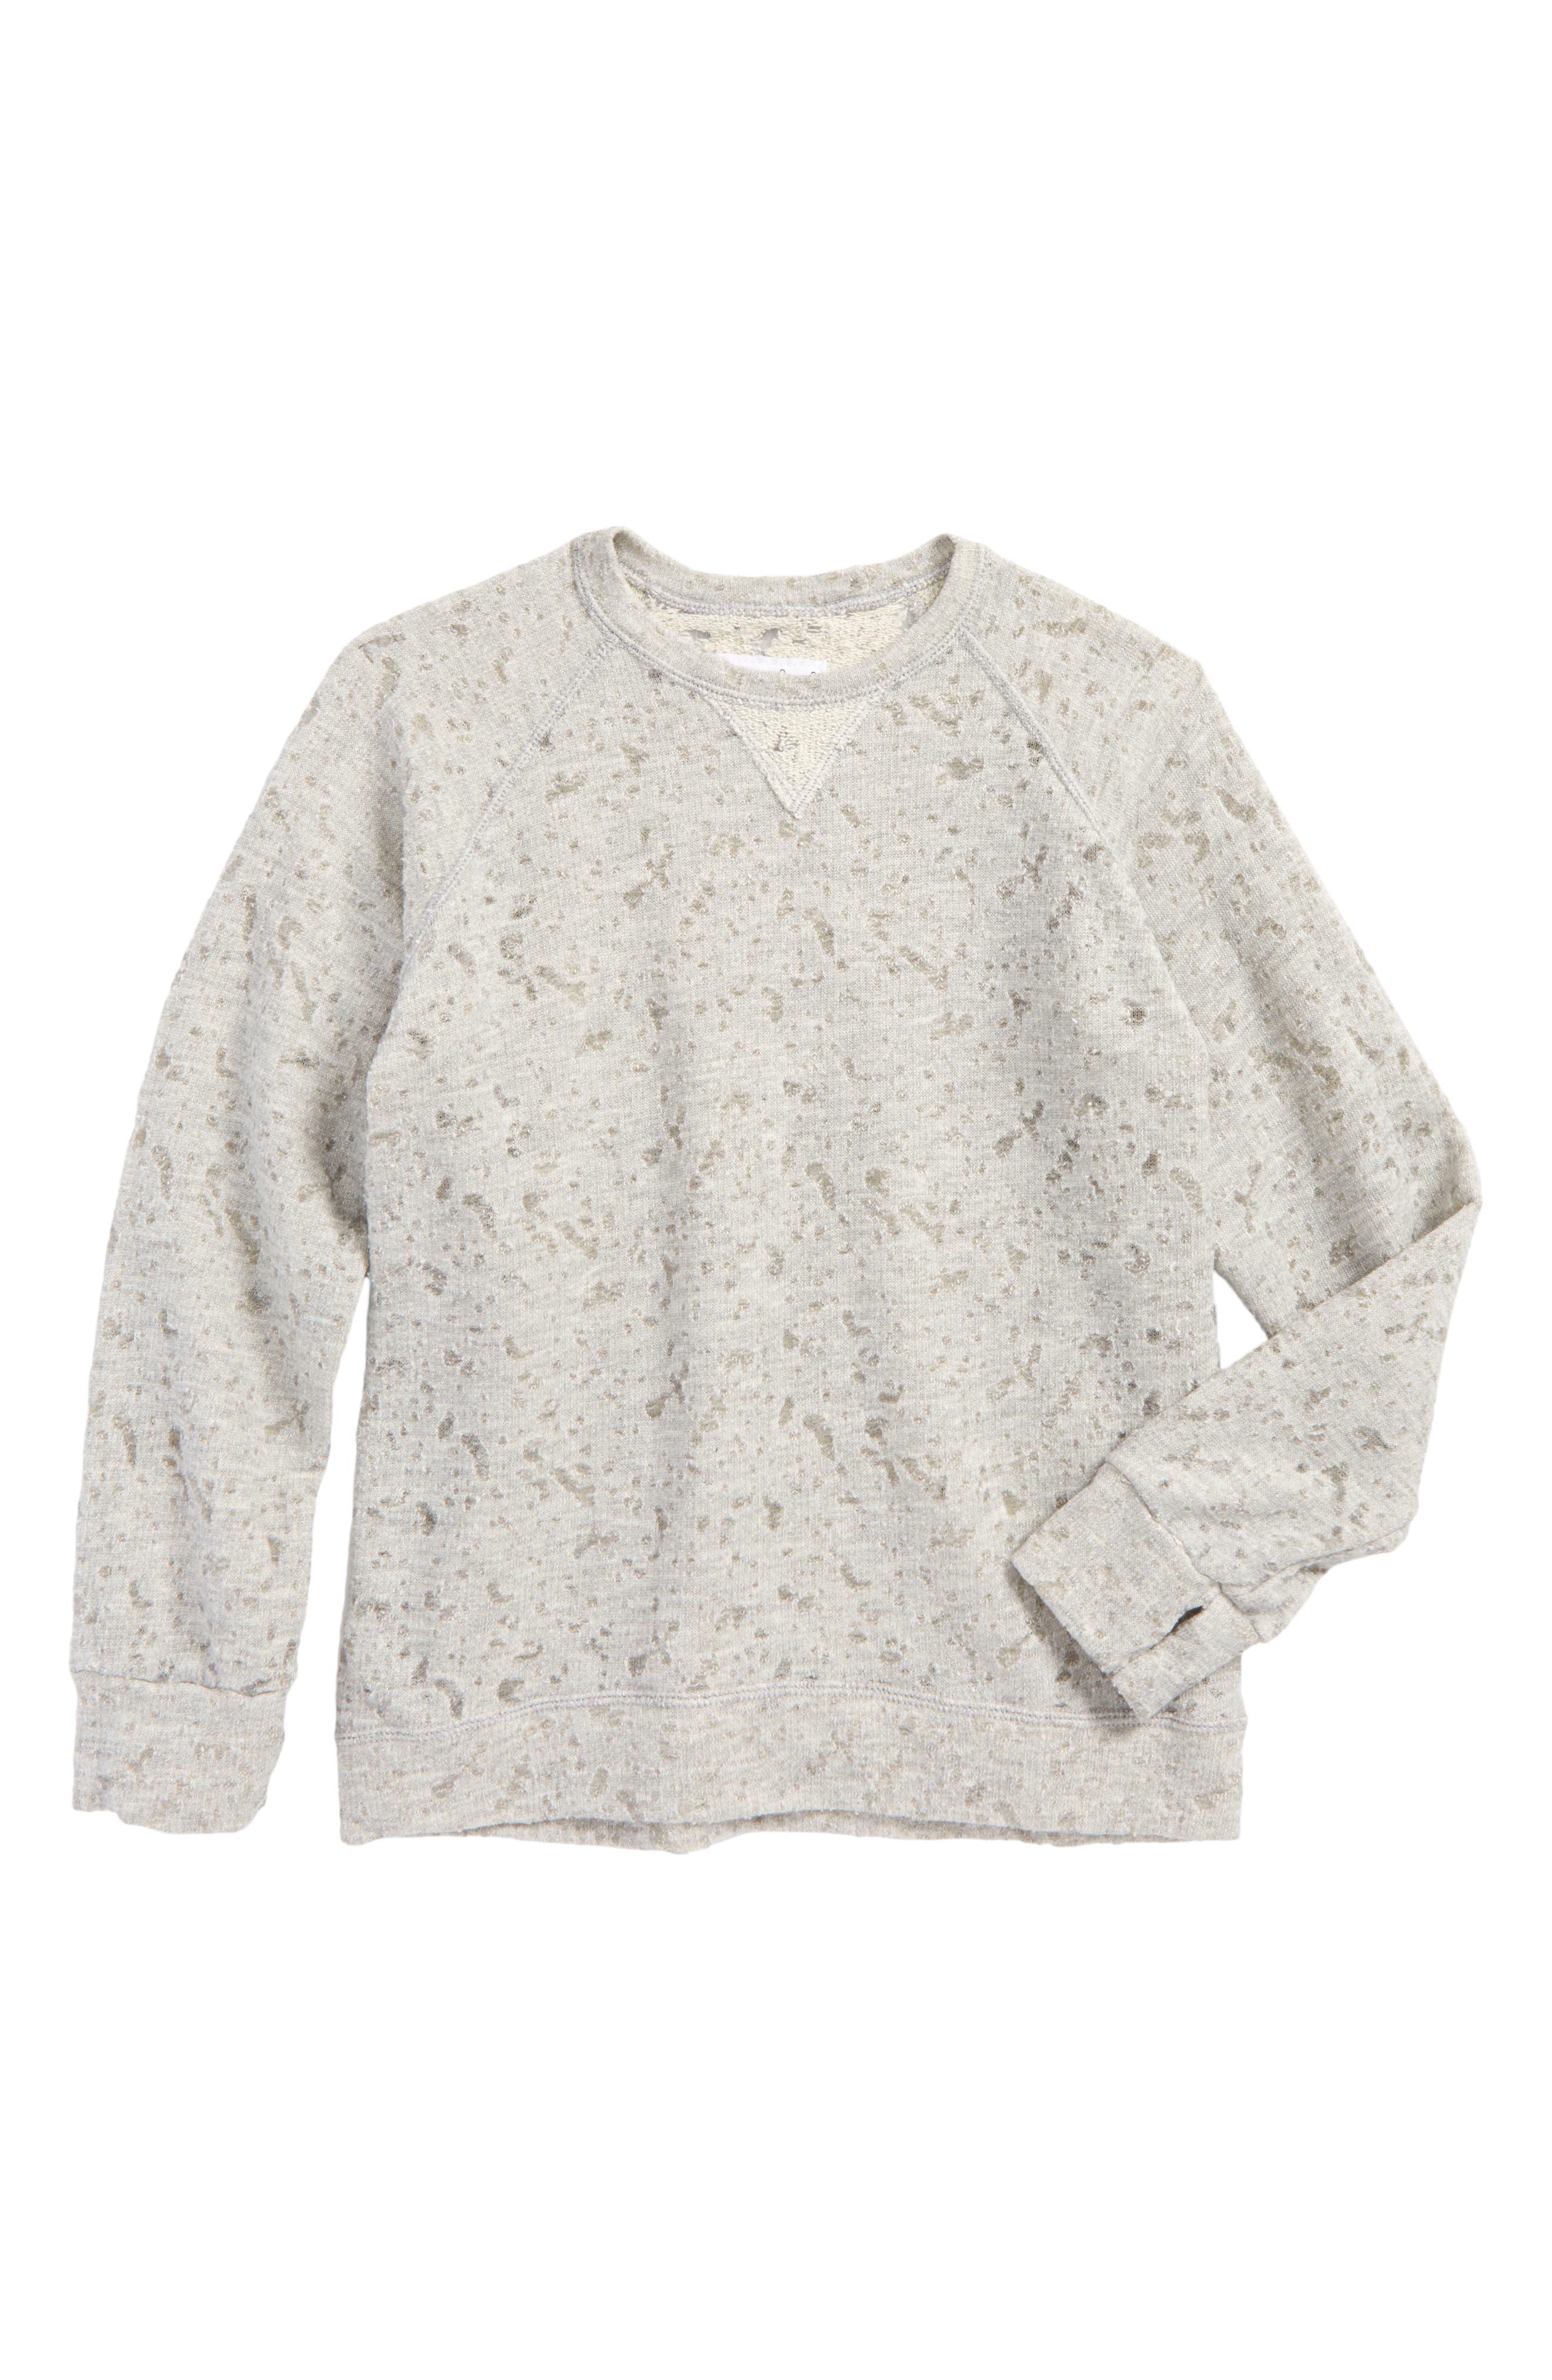 Deconstructed Sweatshirt,                             Main thumbnail 1, color,                             050